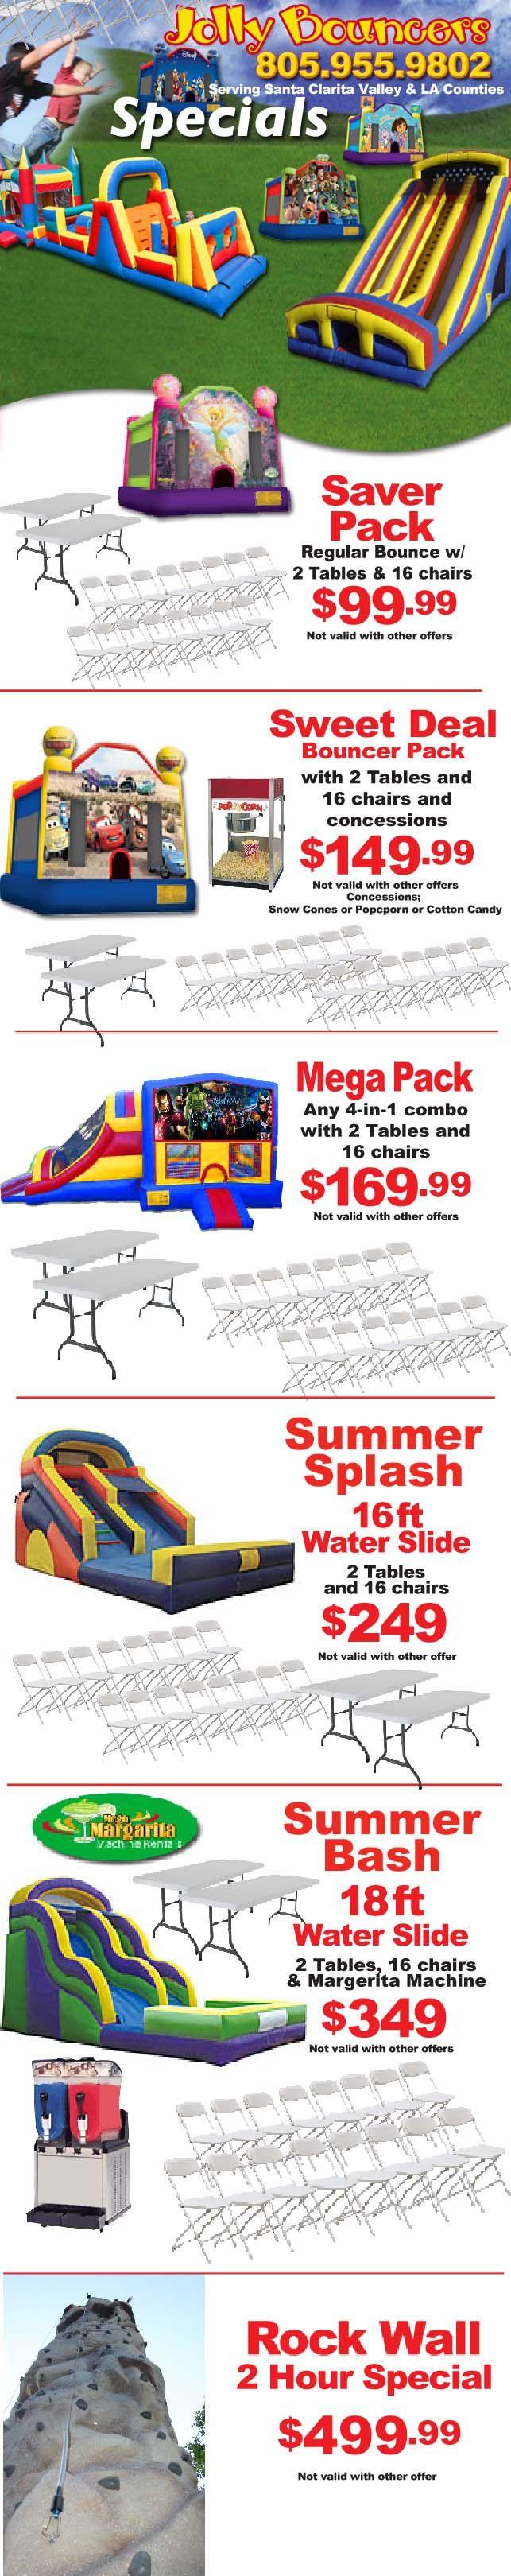 Our Specials : Moonwalk Rentals : Tent Rentals : Popcorn Machine Rental Los Angeles : Jolly Bouncers